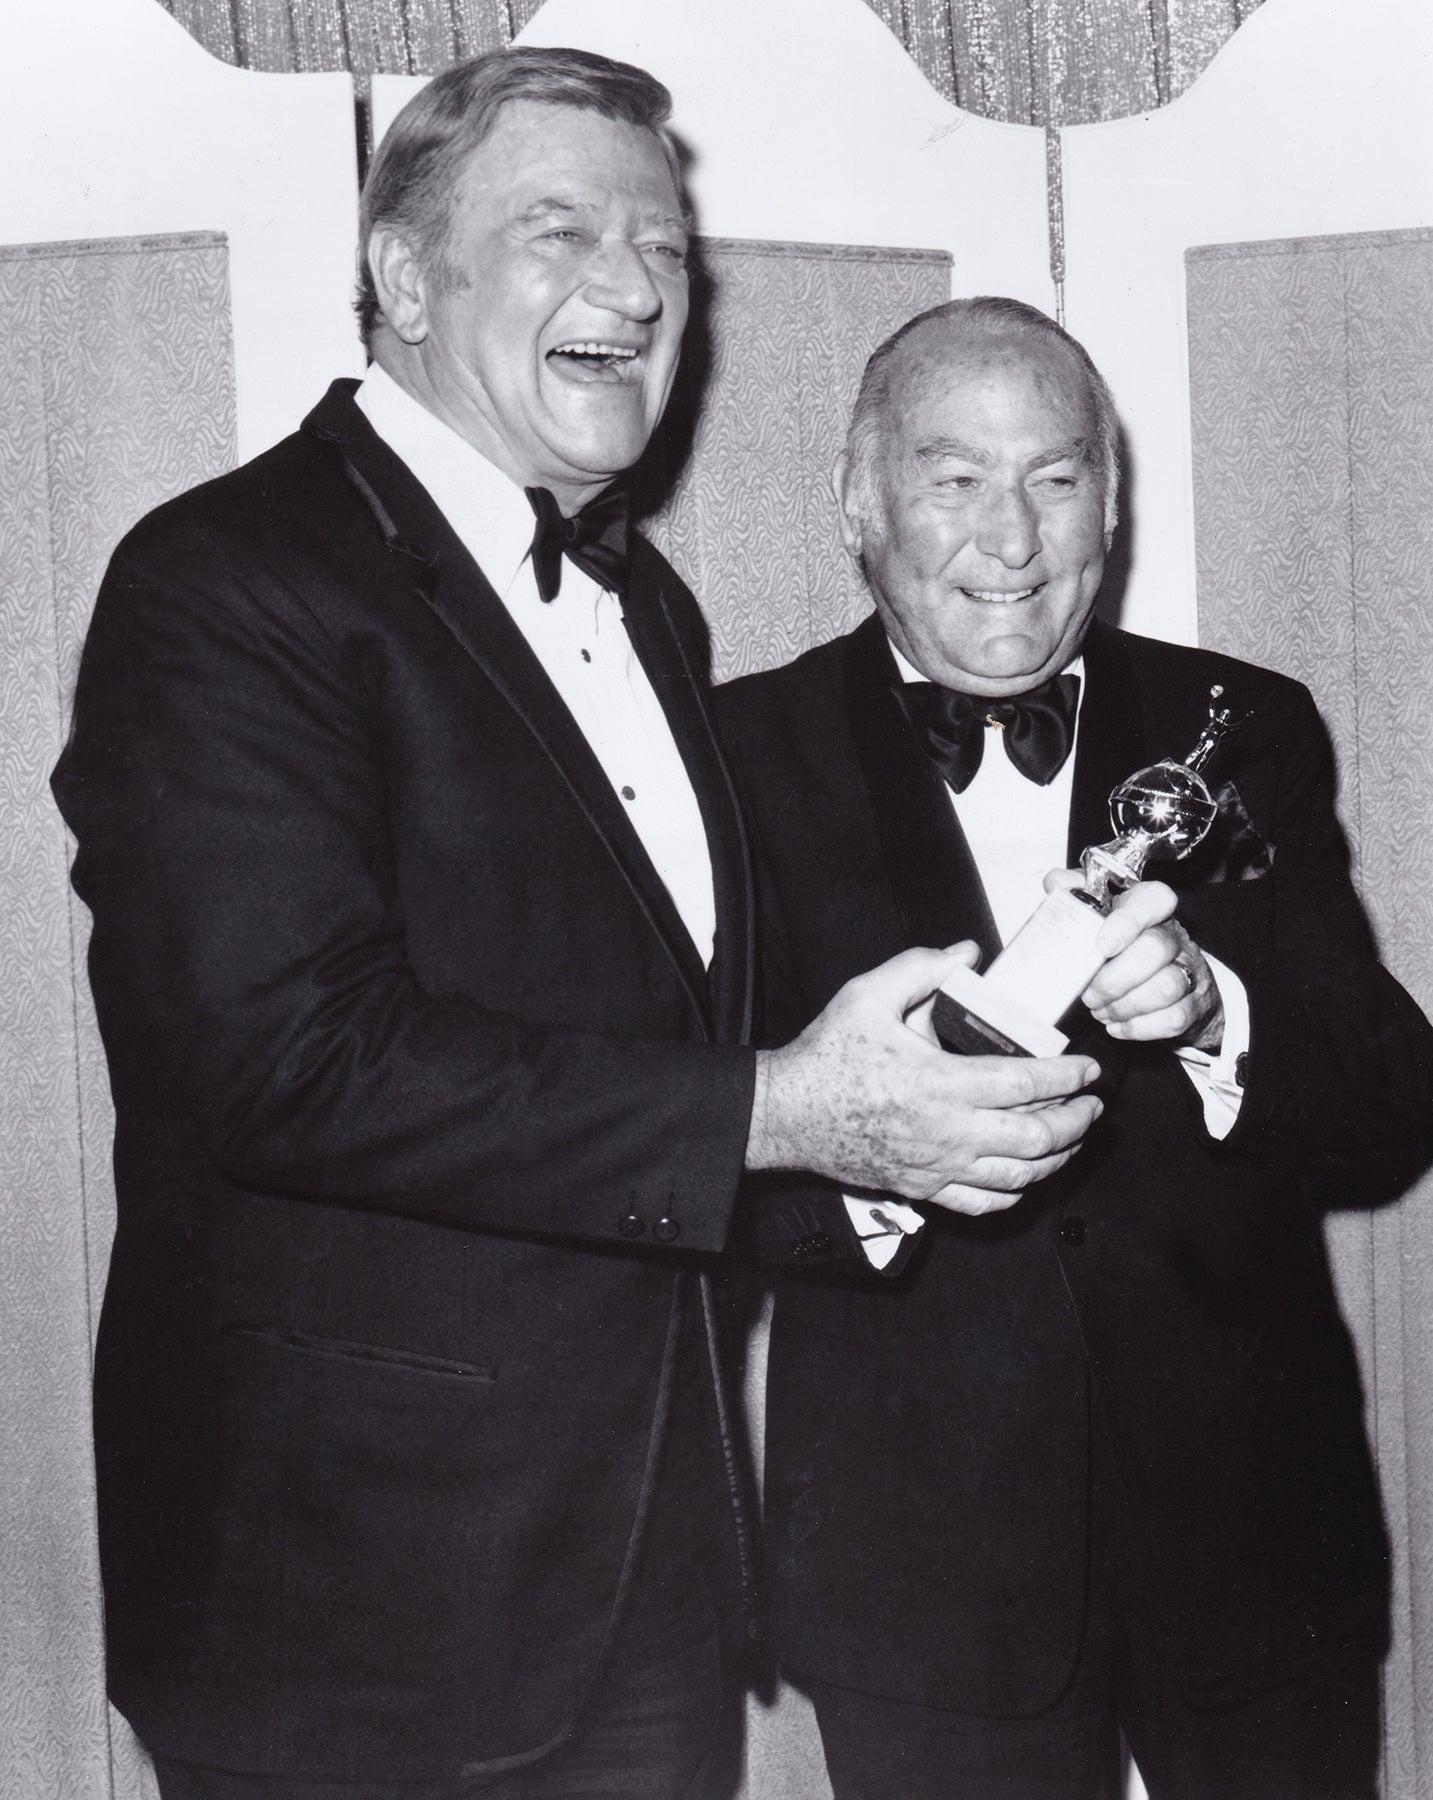 John Wayne presents Cecil B. deMille award to Hal B. Wallis, 1975